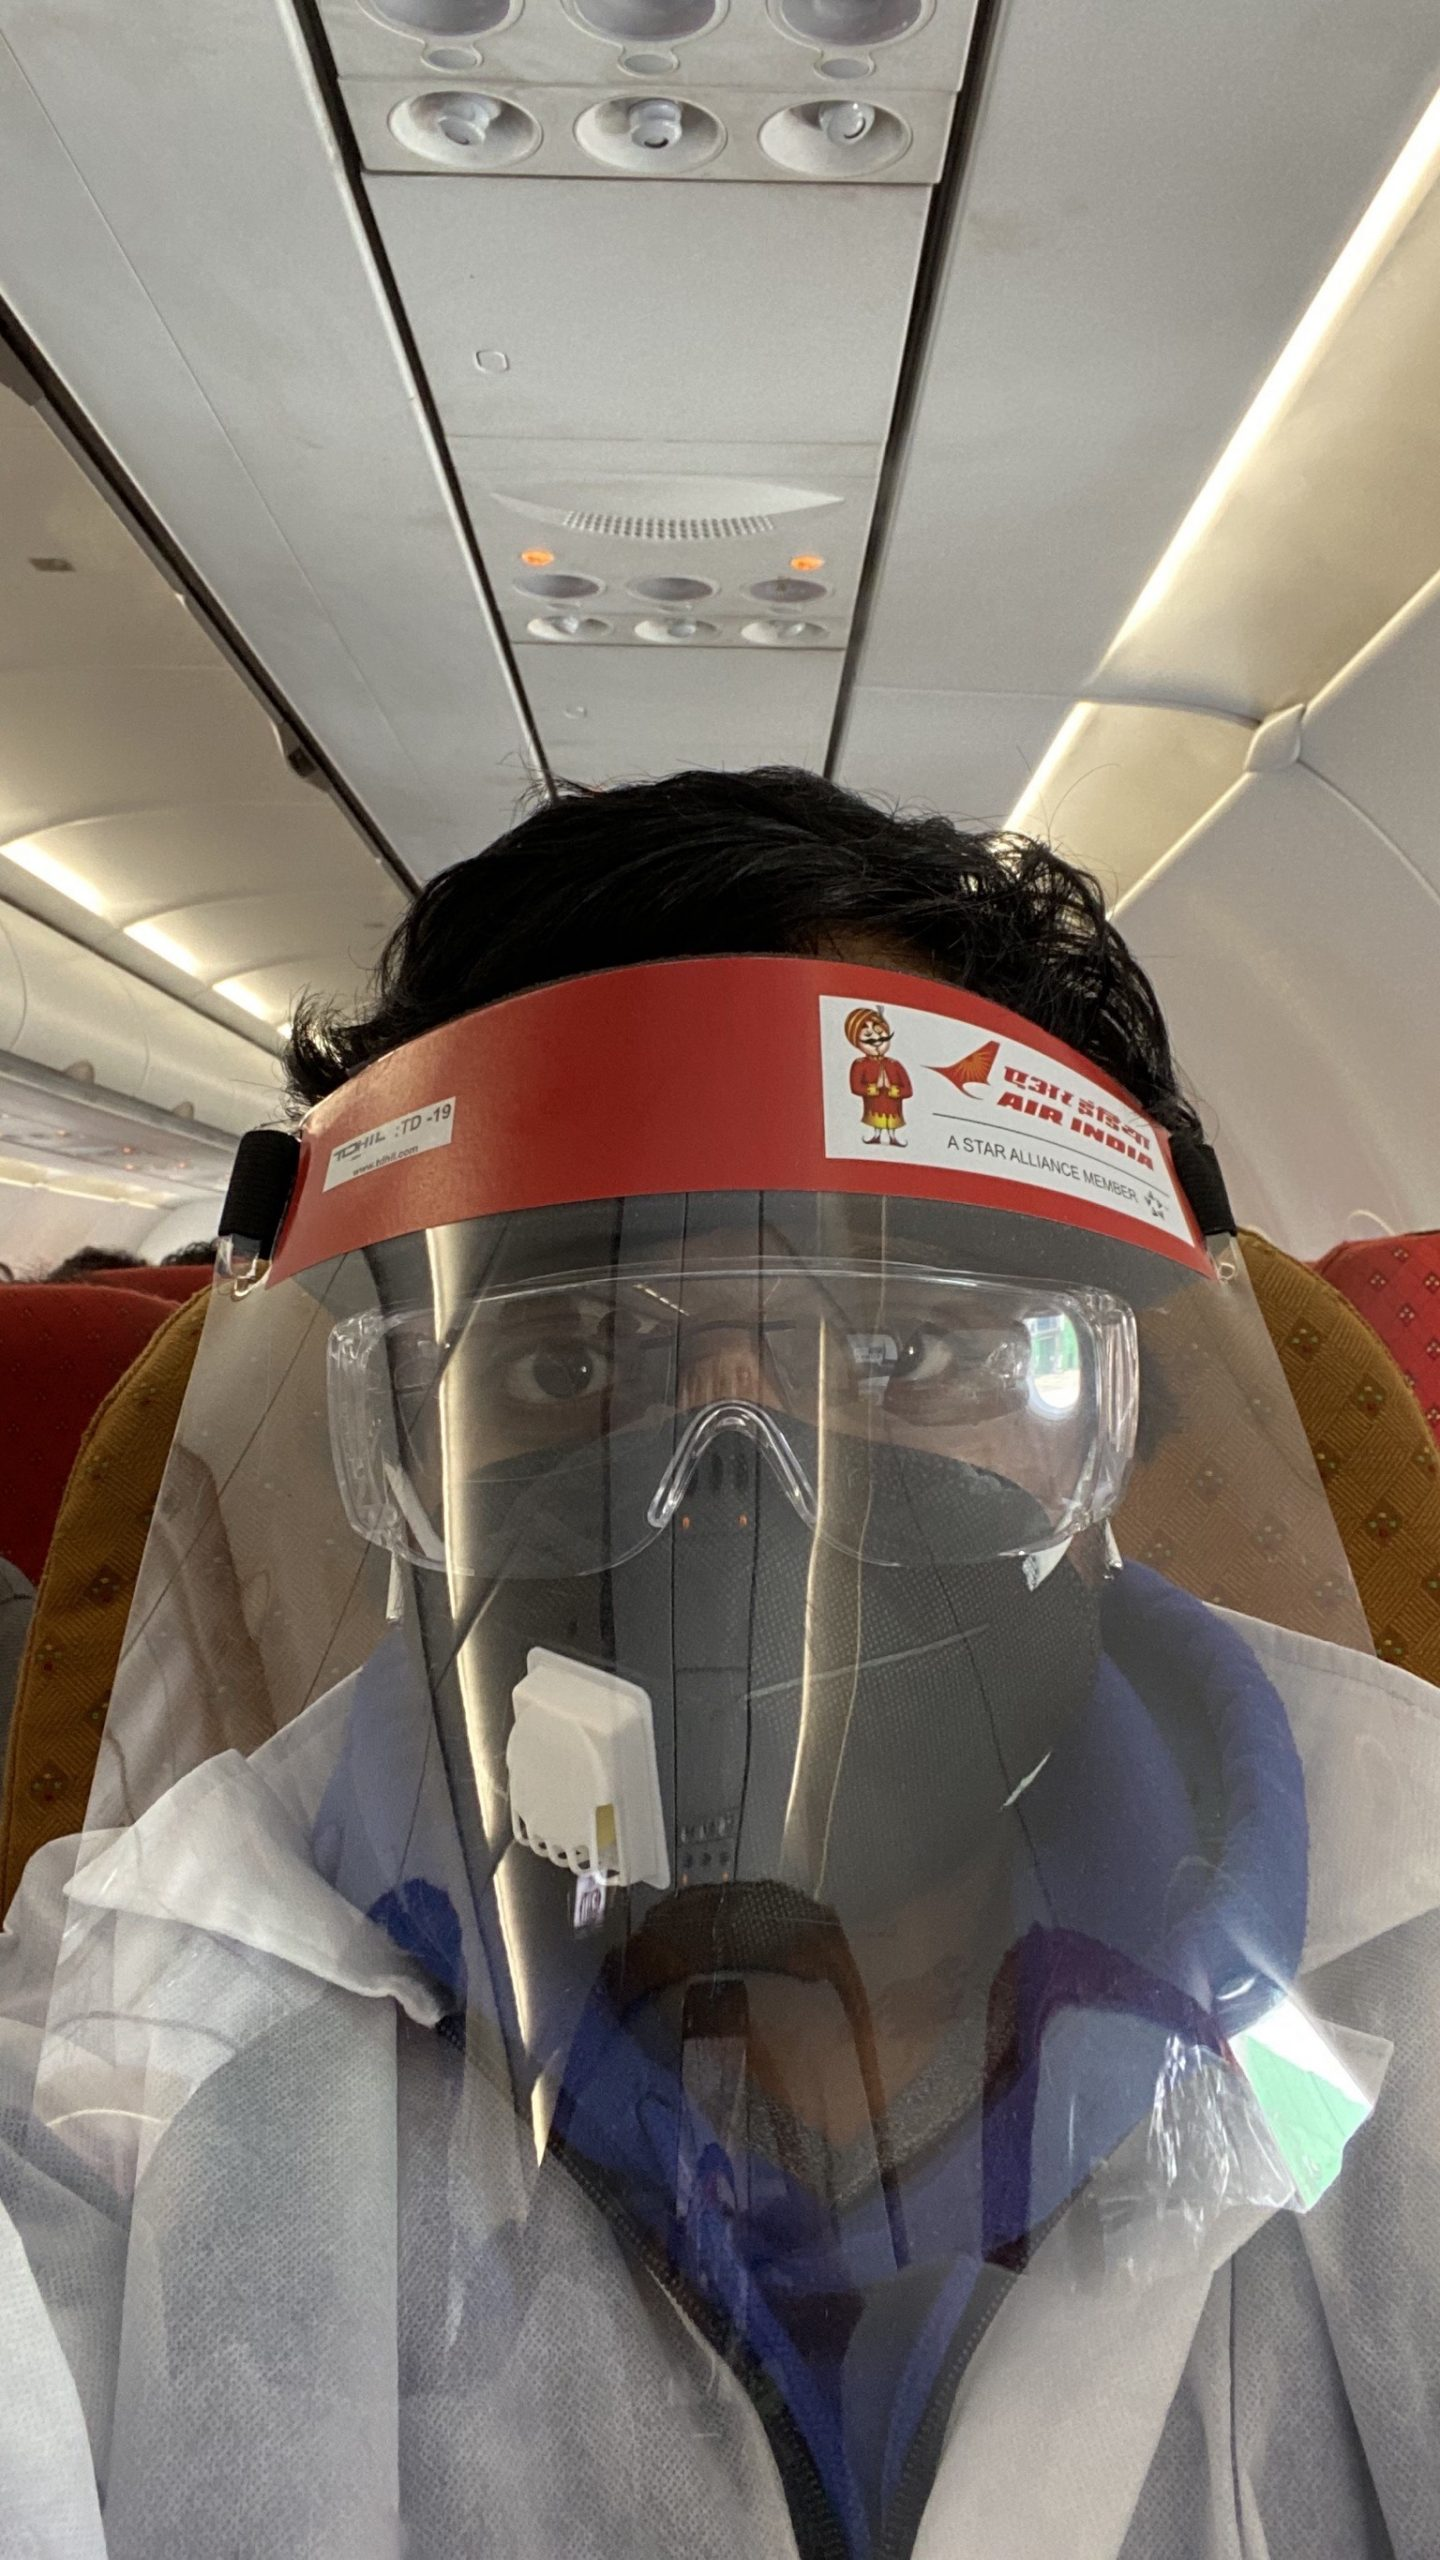 Ram Kumar - Repatriation flight hazmat suit, face shield and PPE